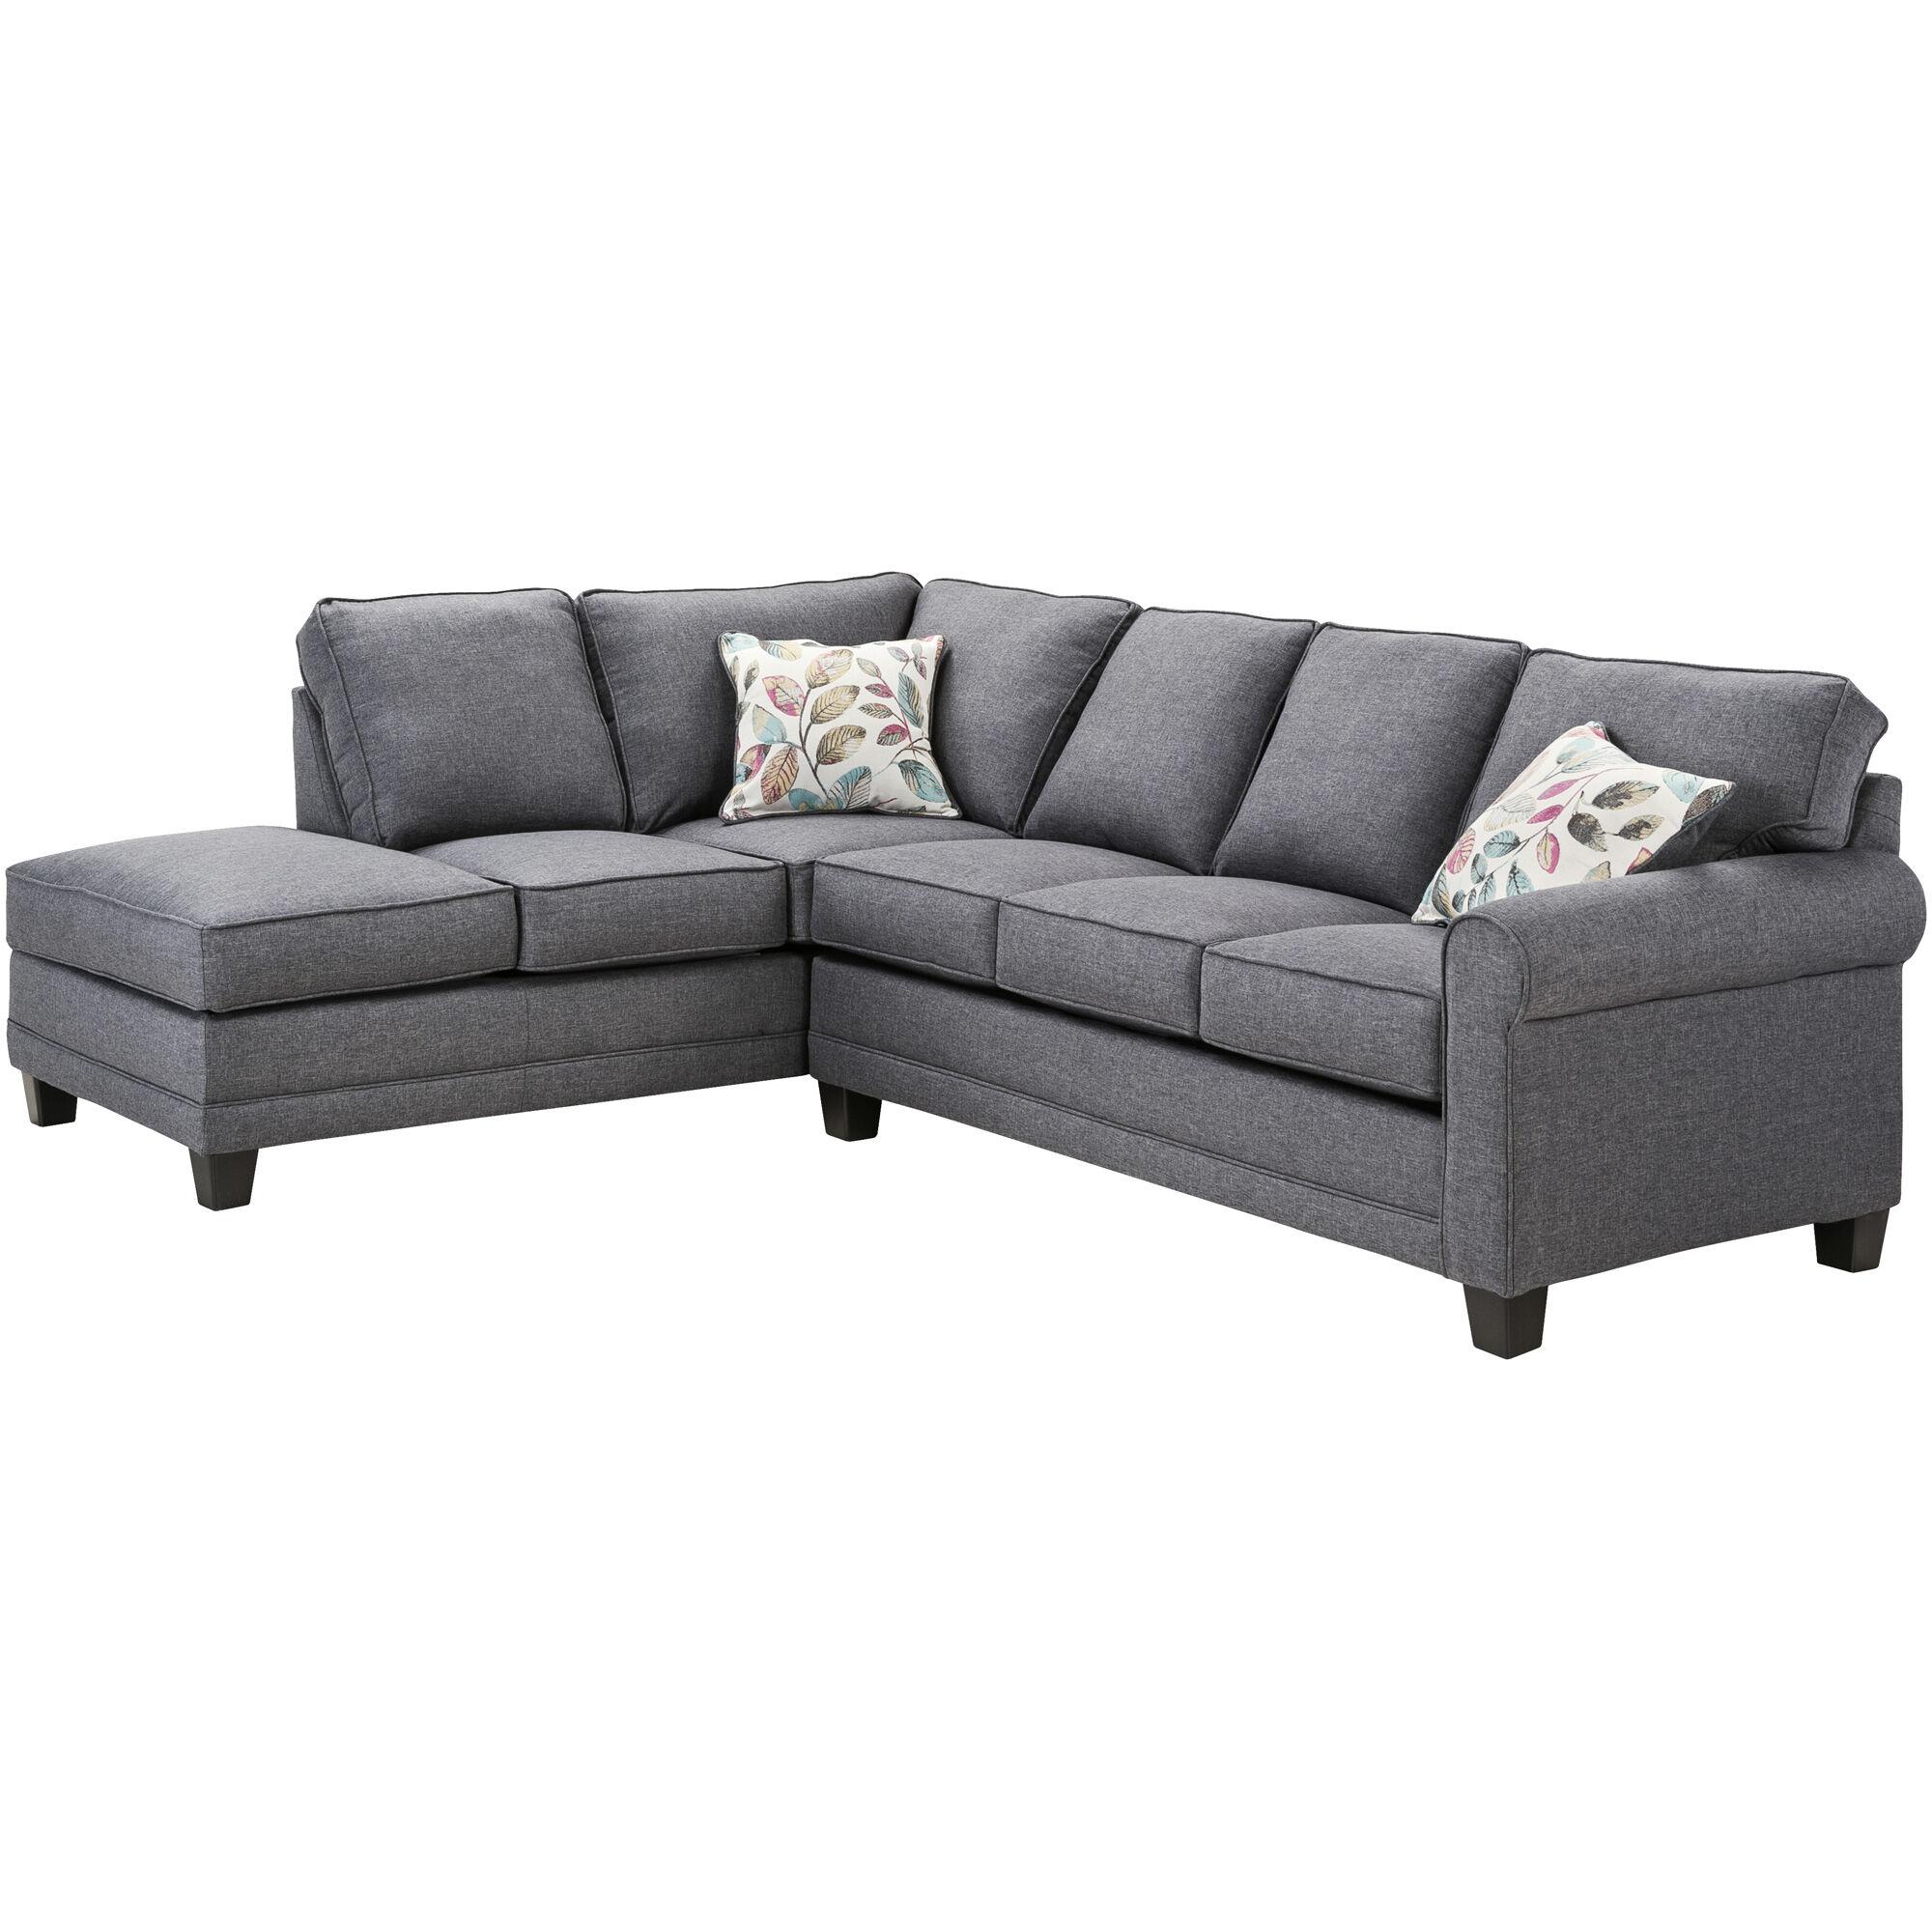 slumberland com sofas reupholstering sofa cushions furniture whittier room group